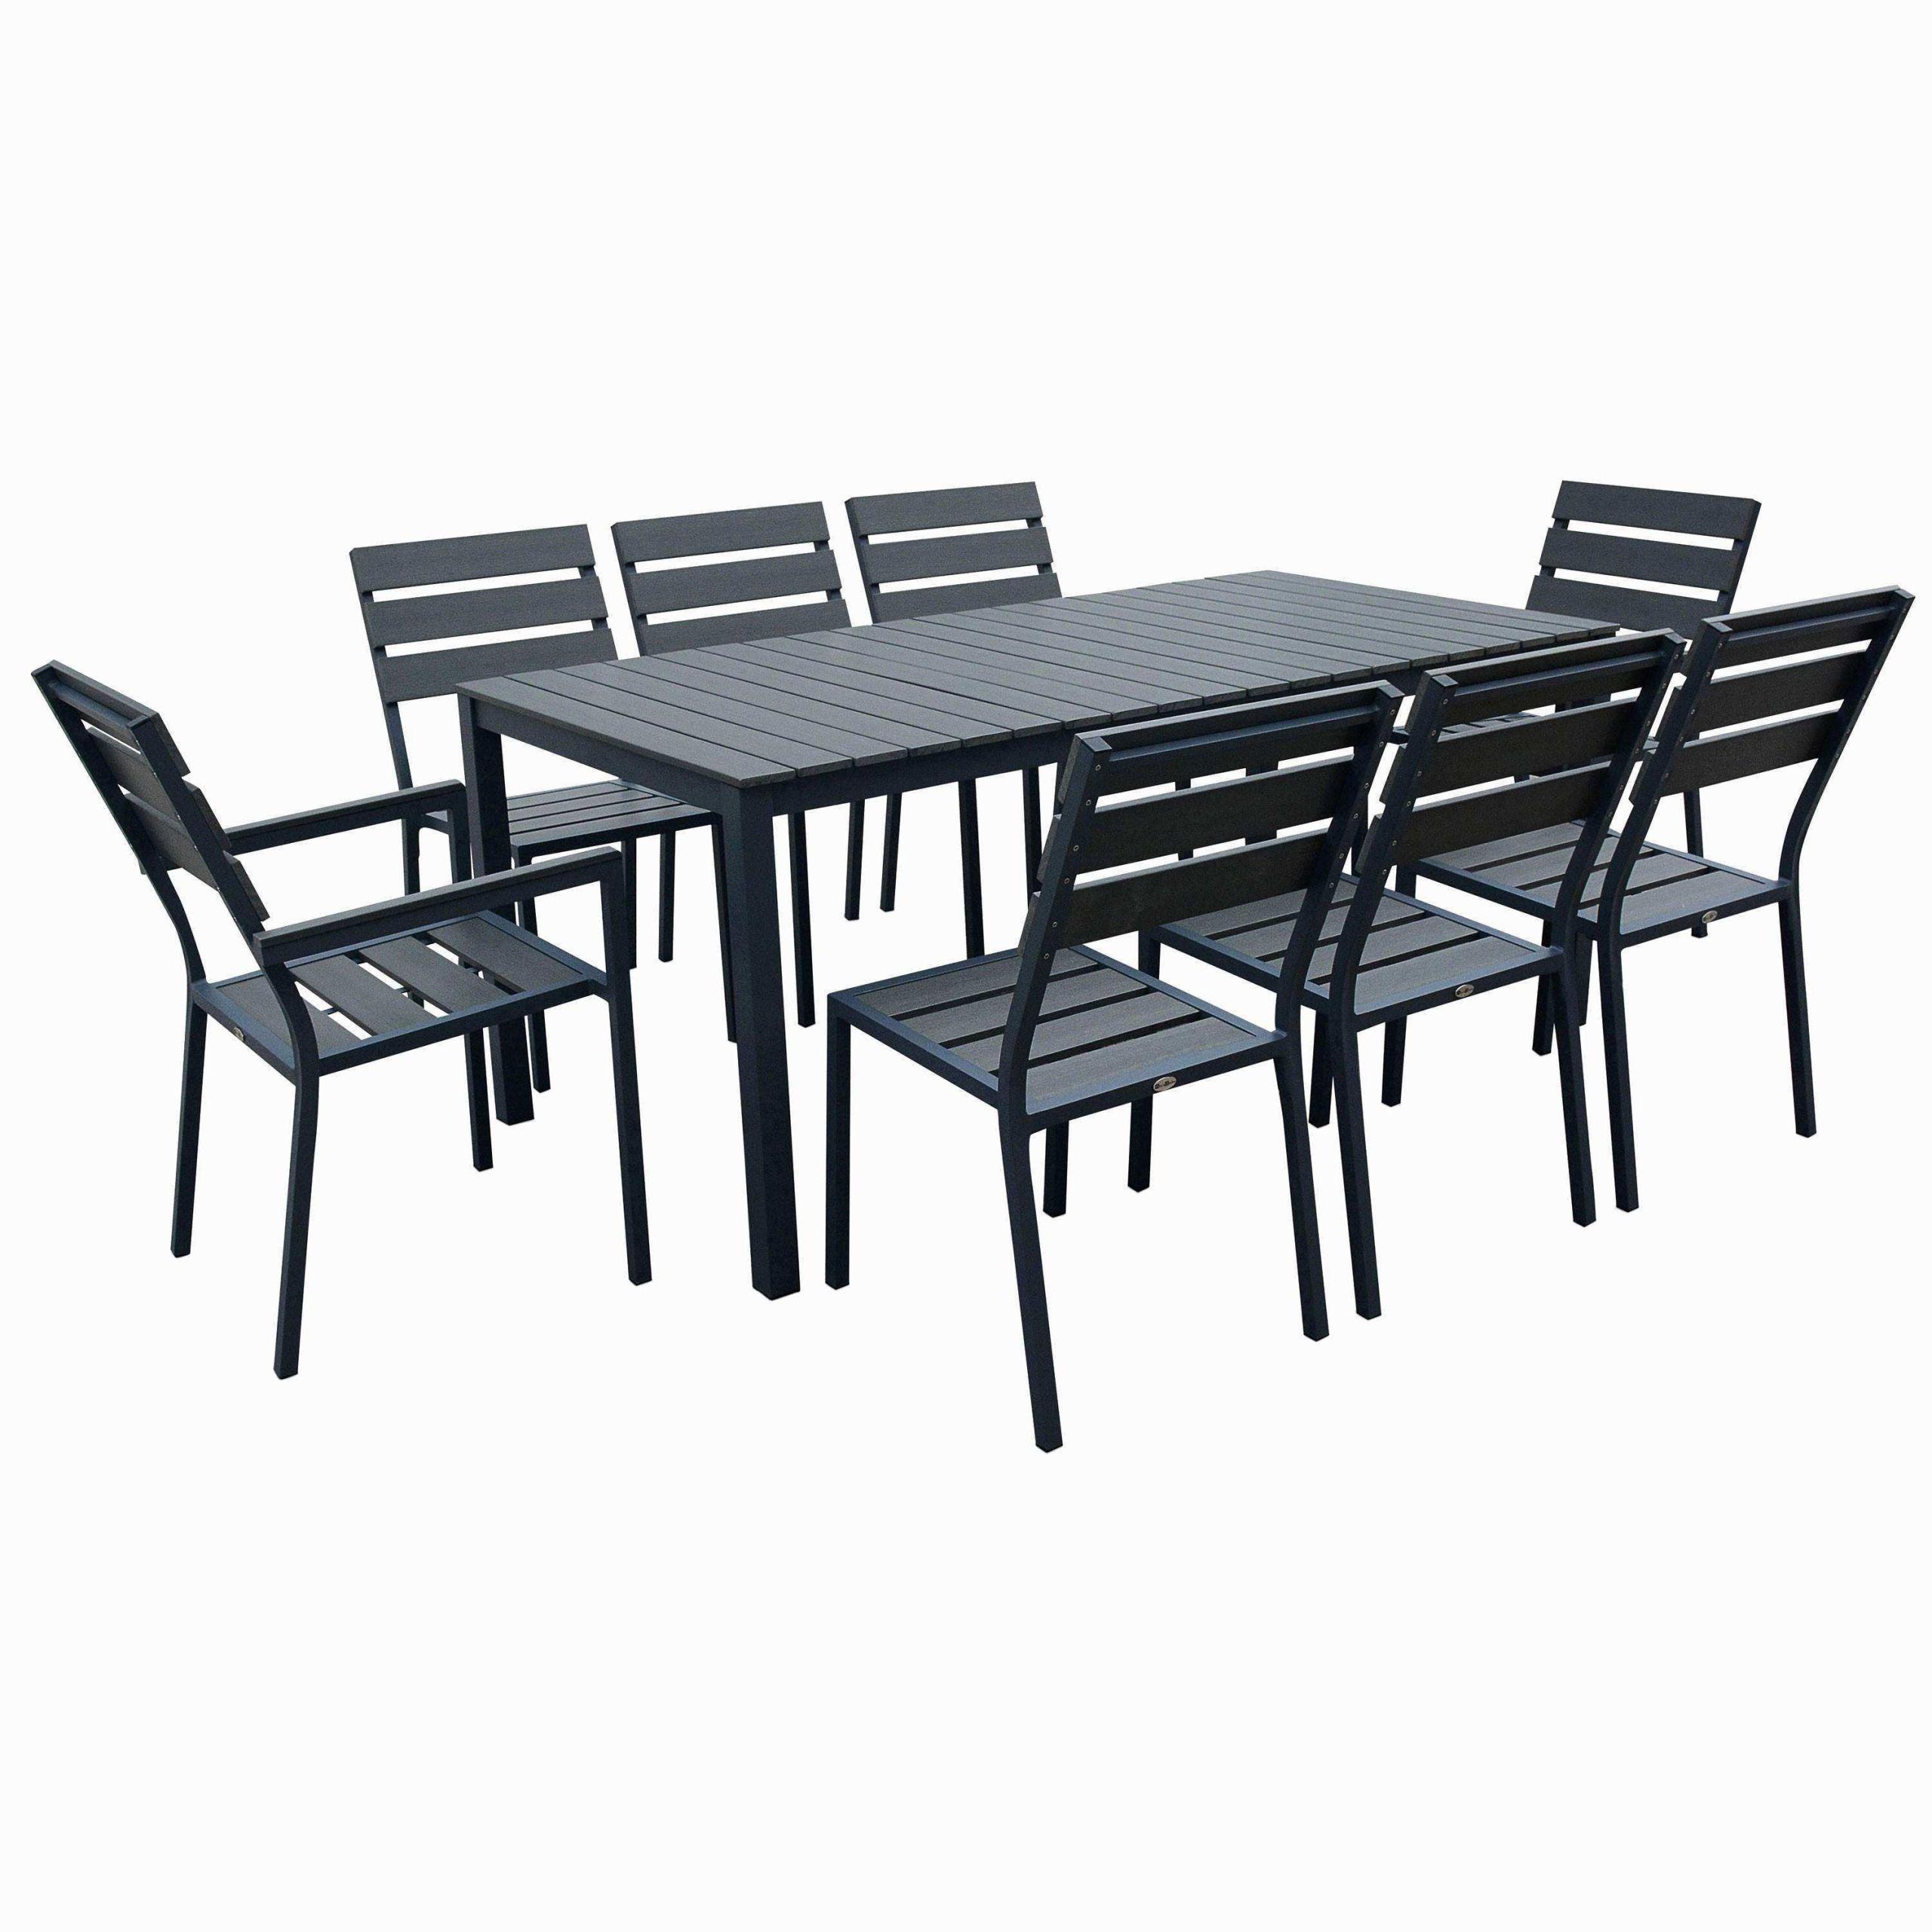 Faire Terrasse Pas Cher 27 beau table de jardin gris anthracite | salon jardin